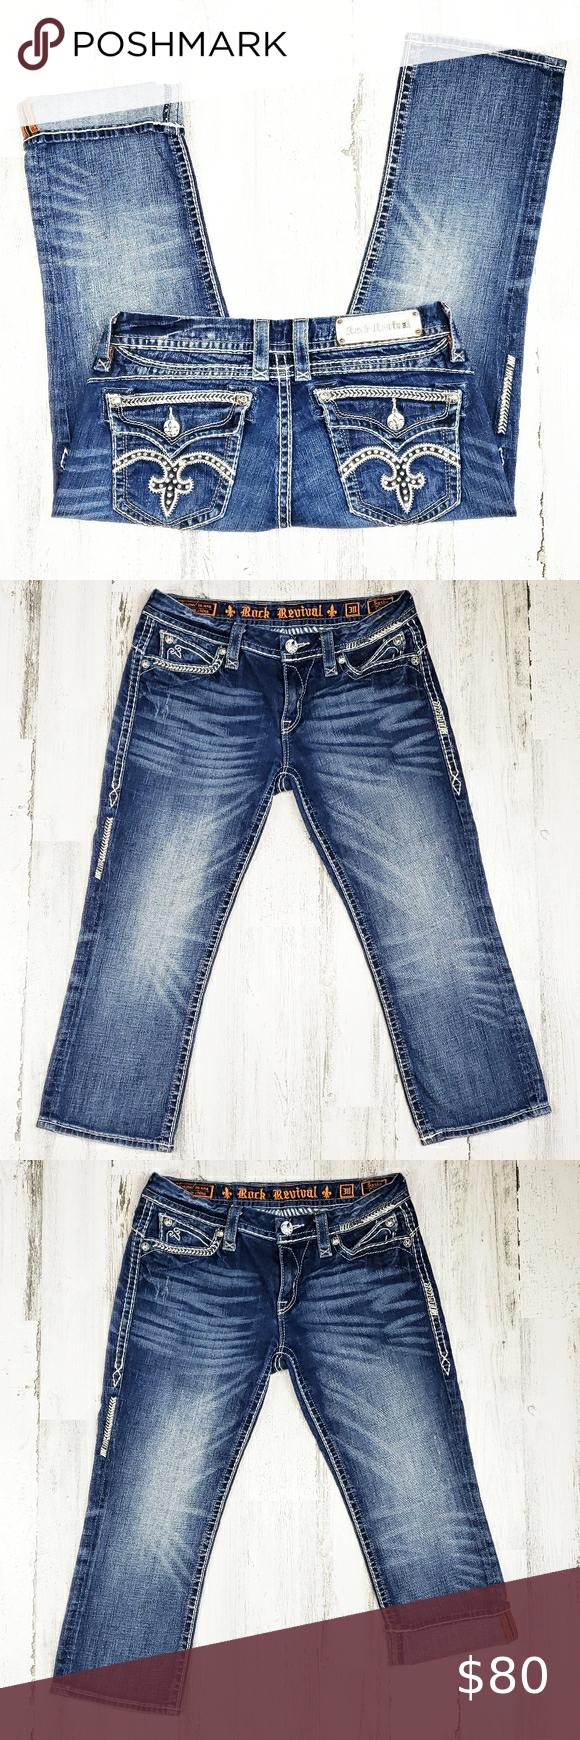 Rock Revival Sasha Capri Jean's.  Size 30. Rock Revival Sasha Capri's Jean's.  Size 30.  Inseam 22